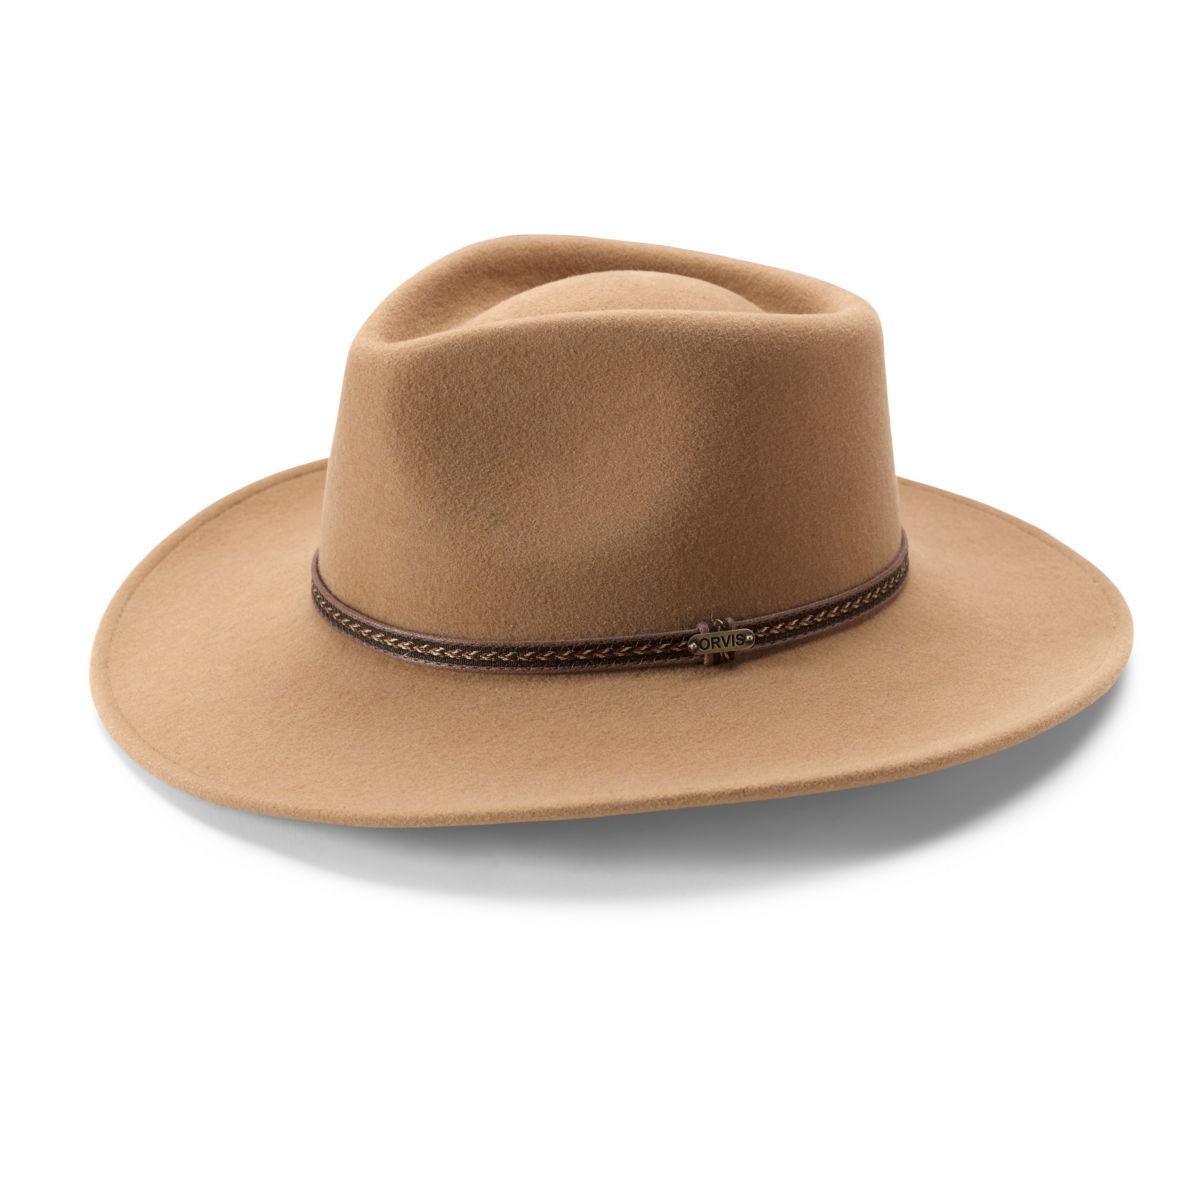 Grouse Creek Wool Felt Hat - FAWNimage number 0